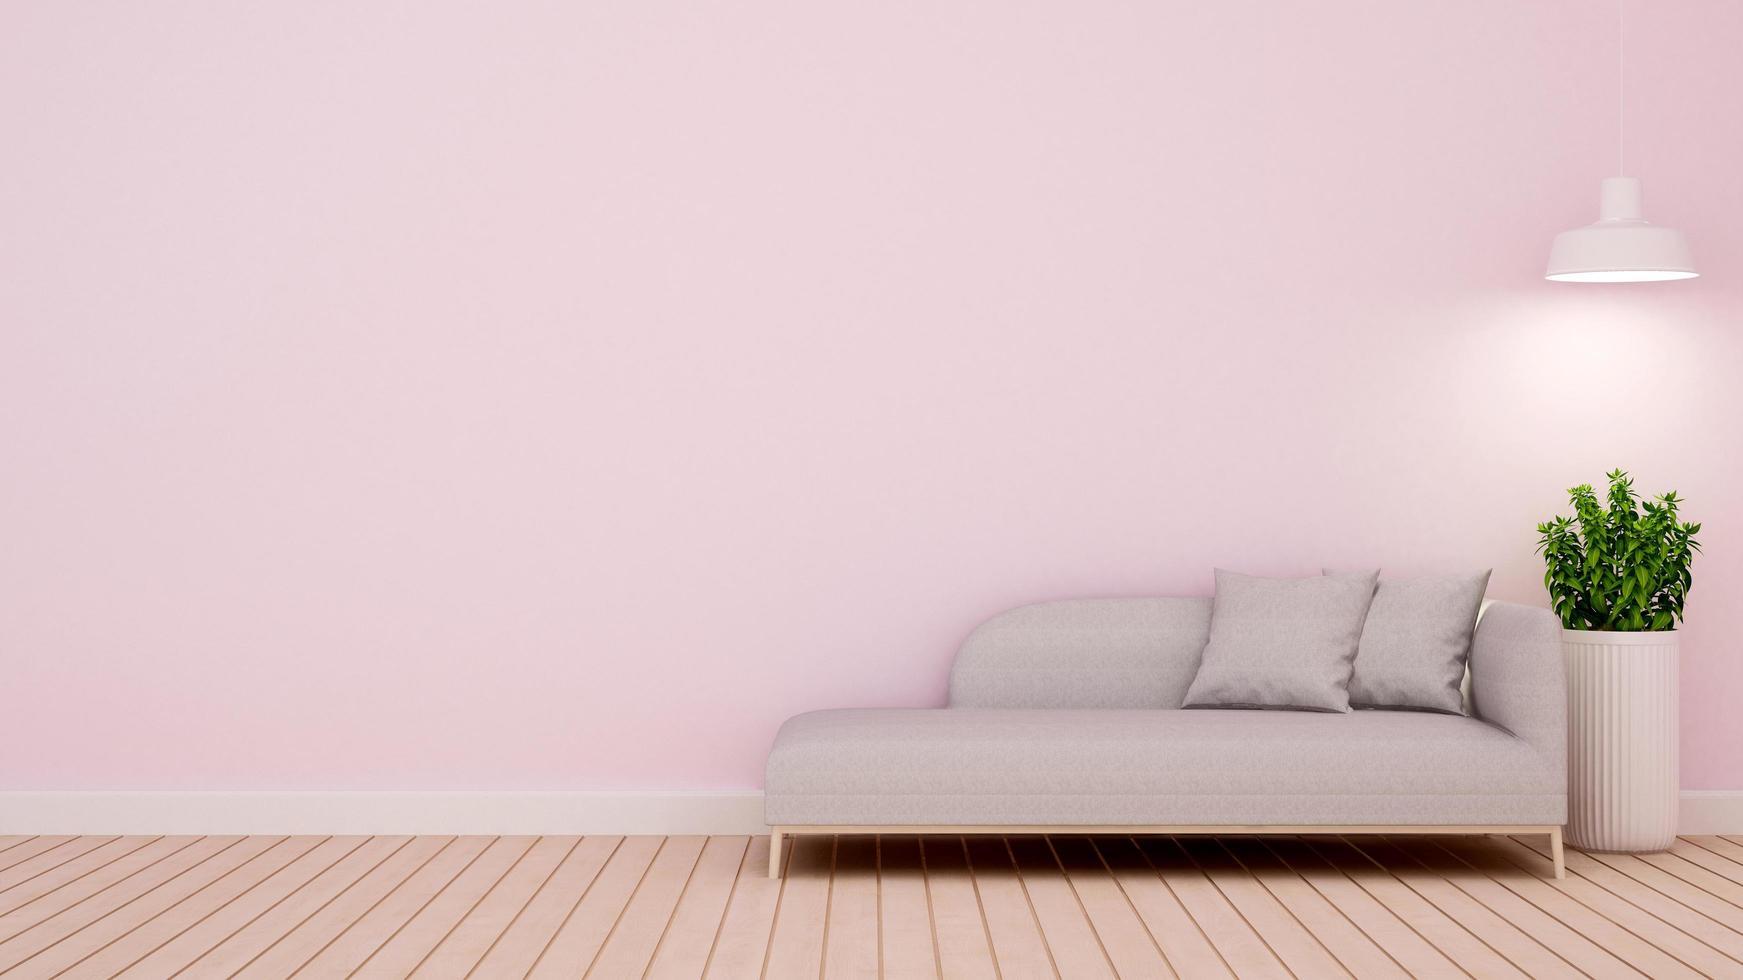 sala de estar en casa o apartamento foto